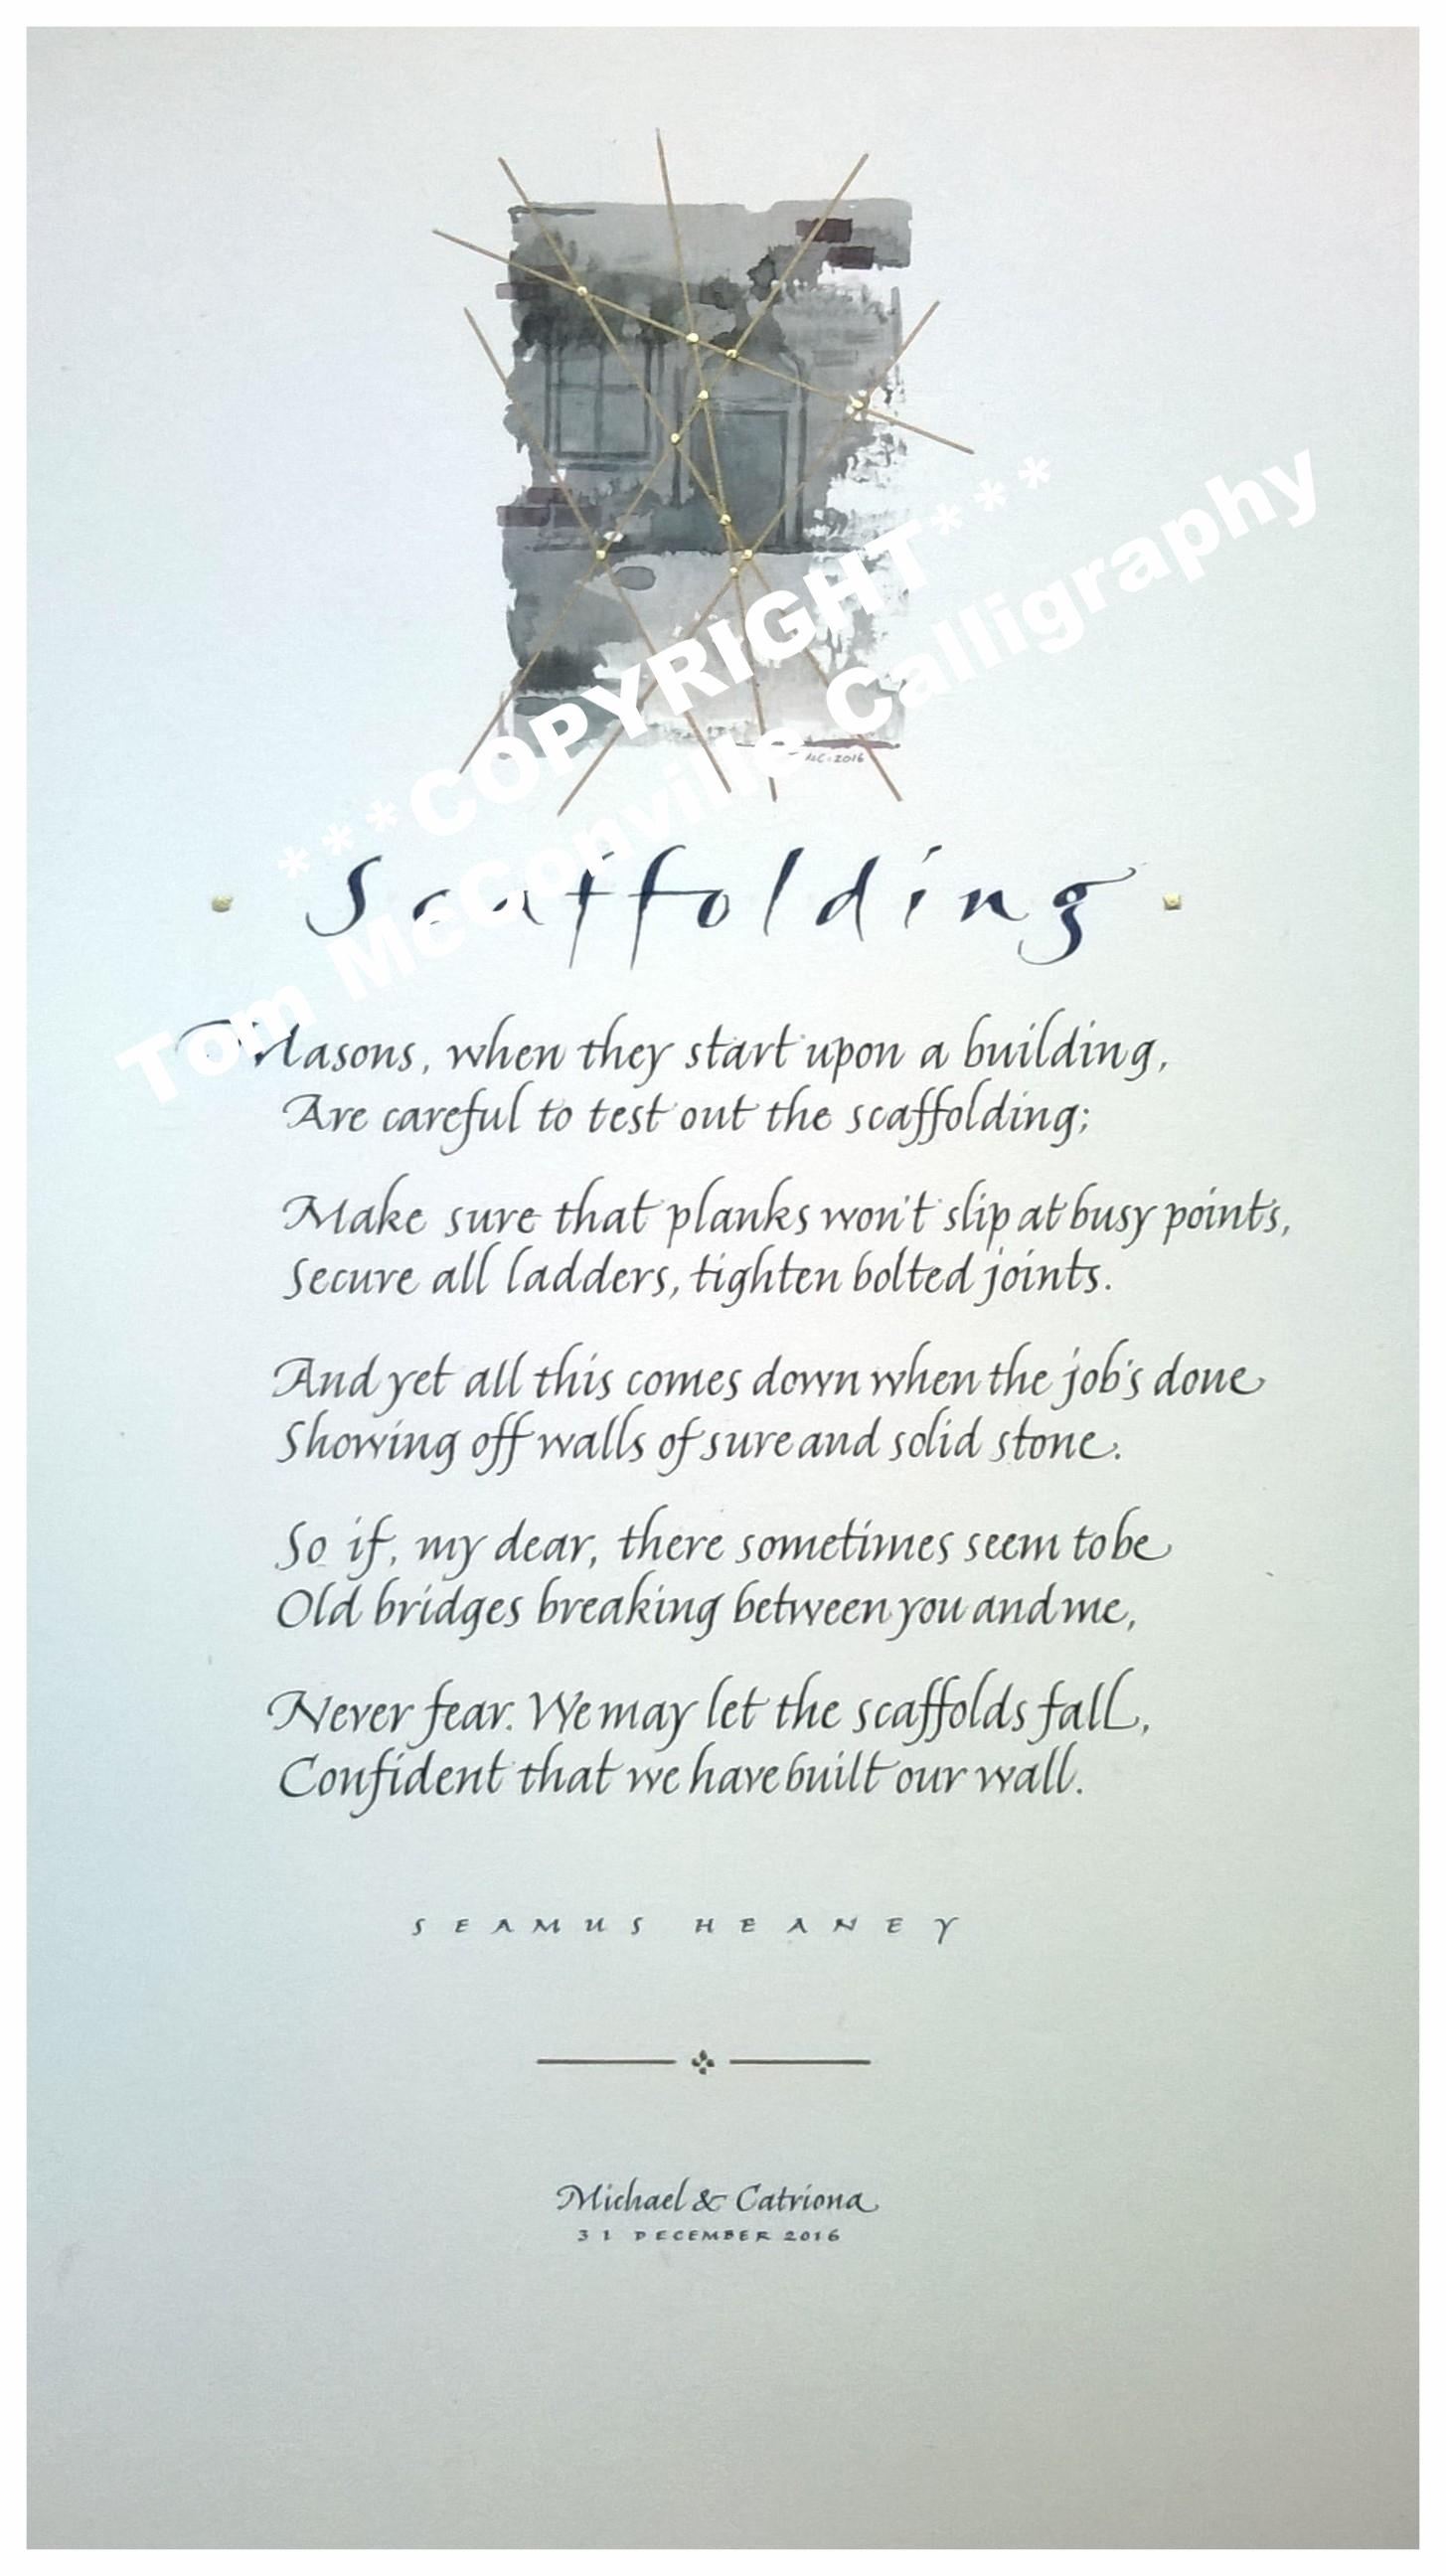 'Scaffolding' by Seamus Heaney